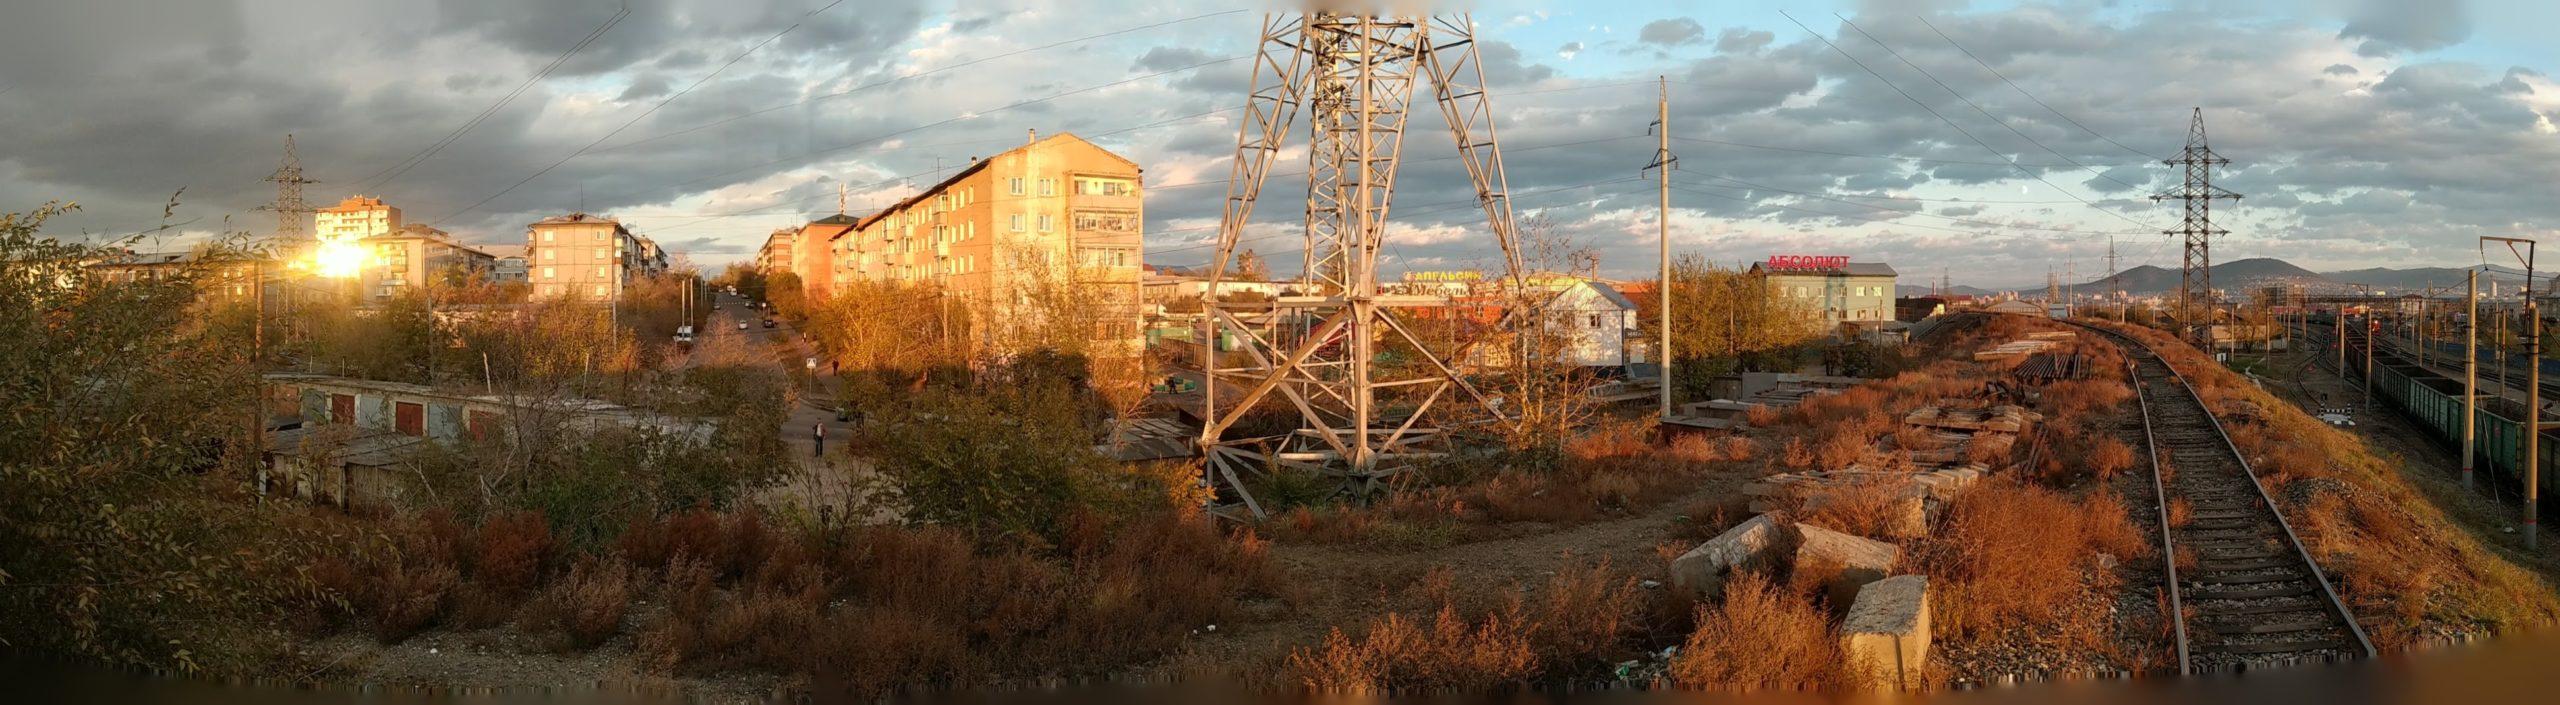 Панорамные фото. В Улан-Удэ